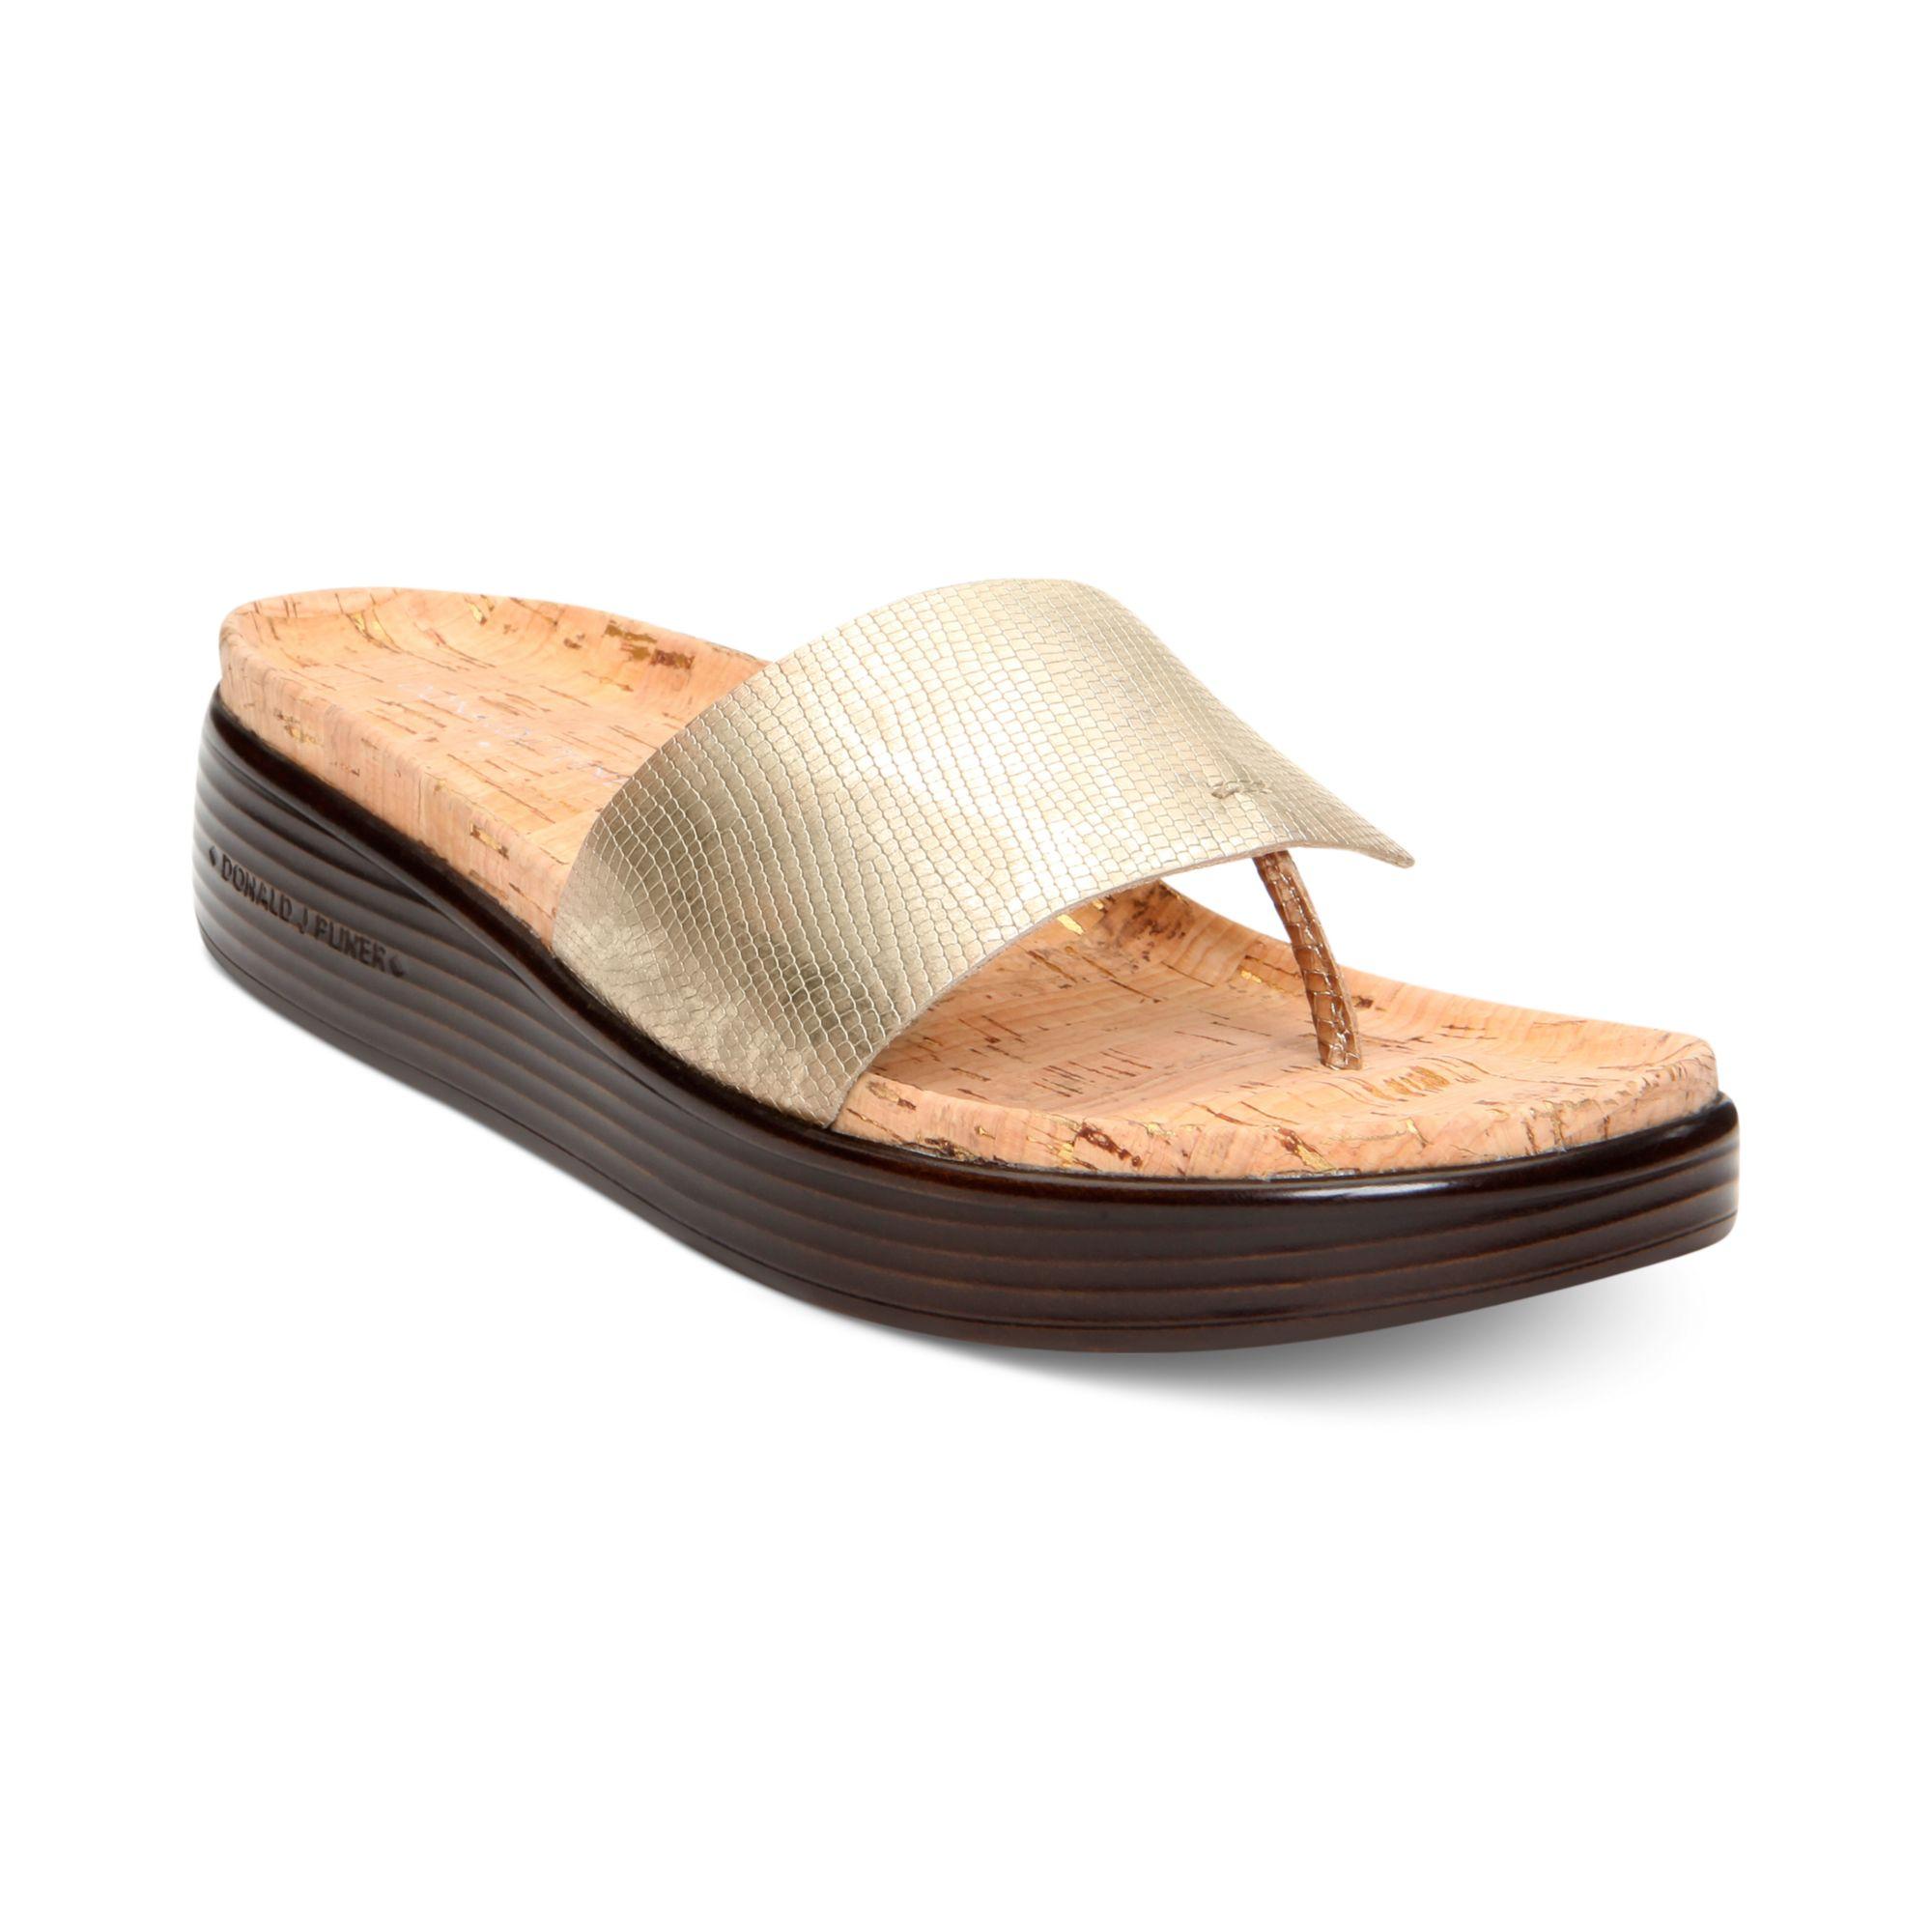 e48692e9b036 Donald J Pliner - Metallic Donald J Pliner Womens Fifi Flatform Thong  Sandals - Lyst